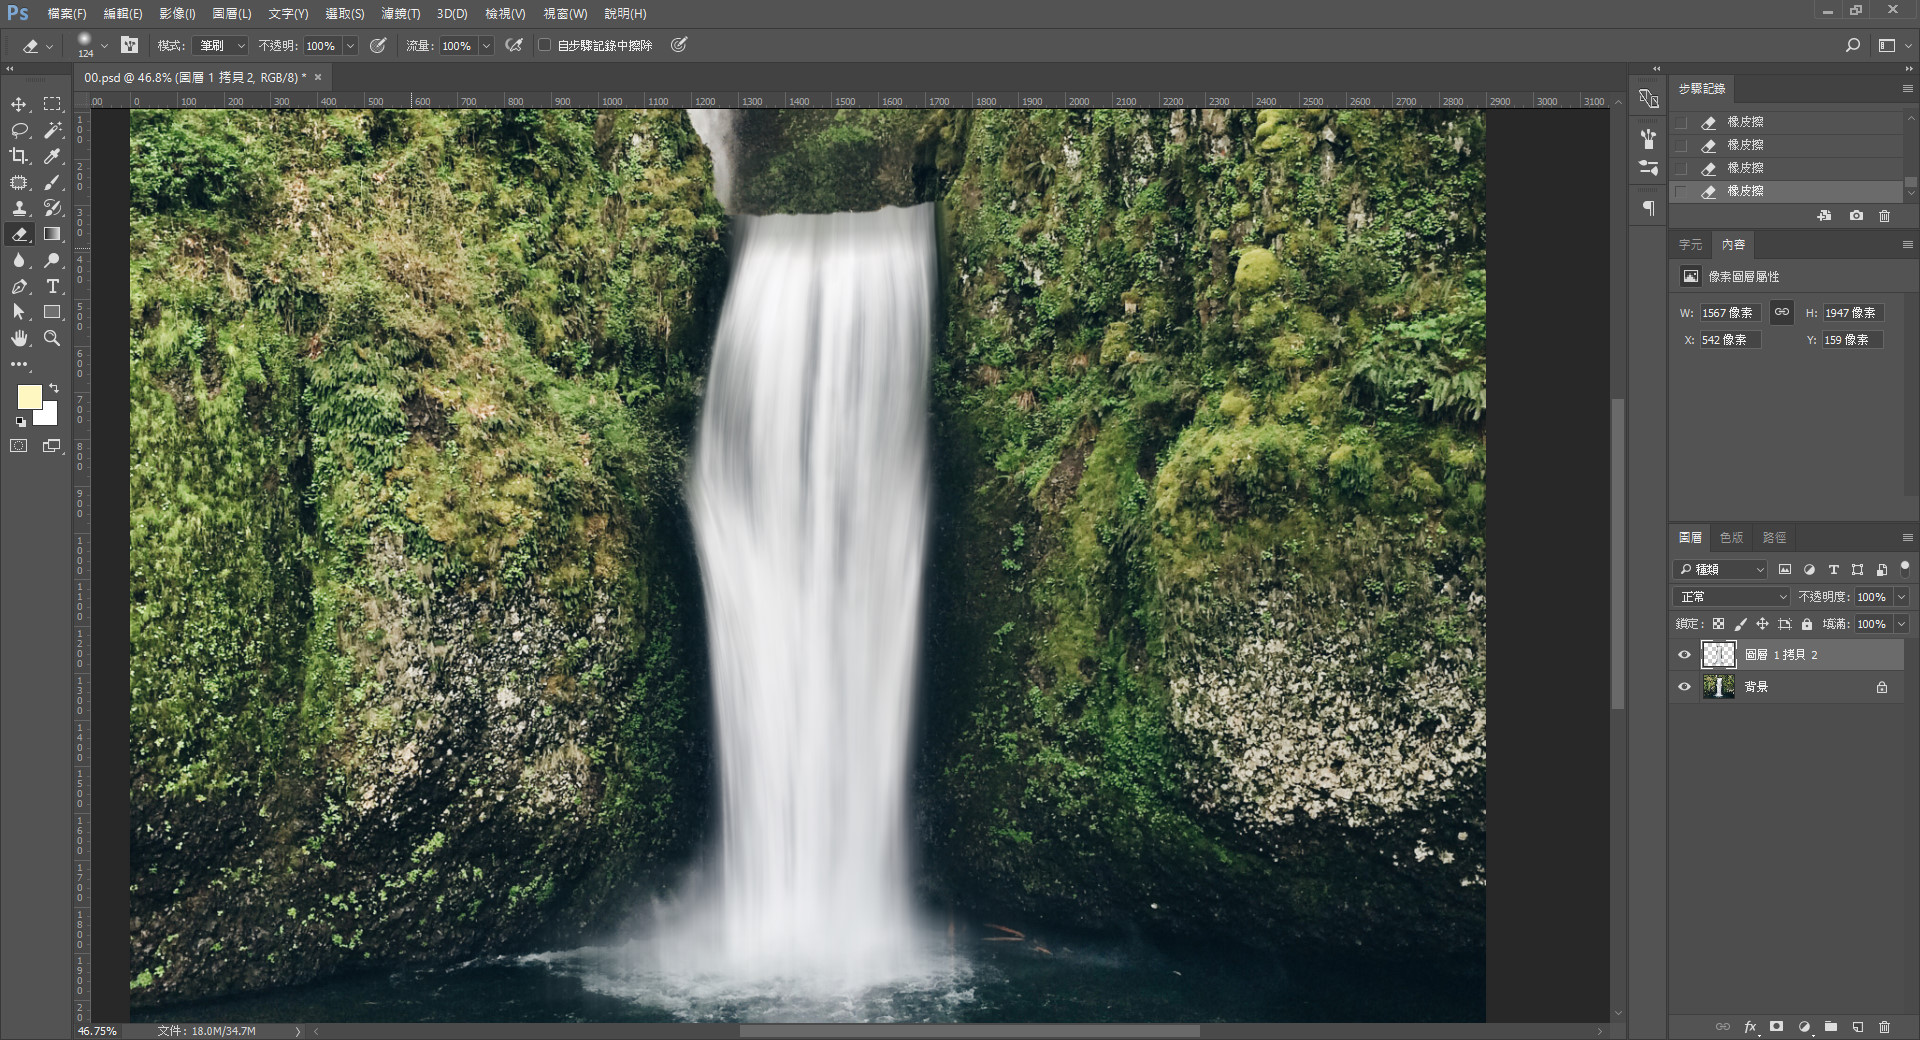 Photoshop - Path Blur Tool (13)